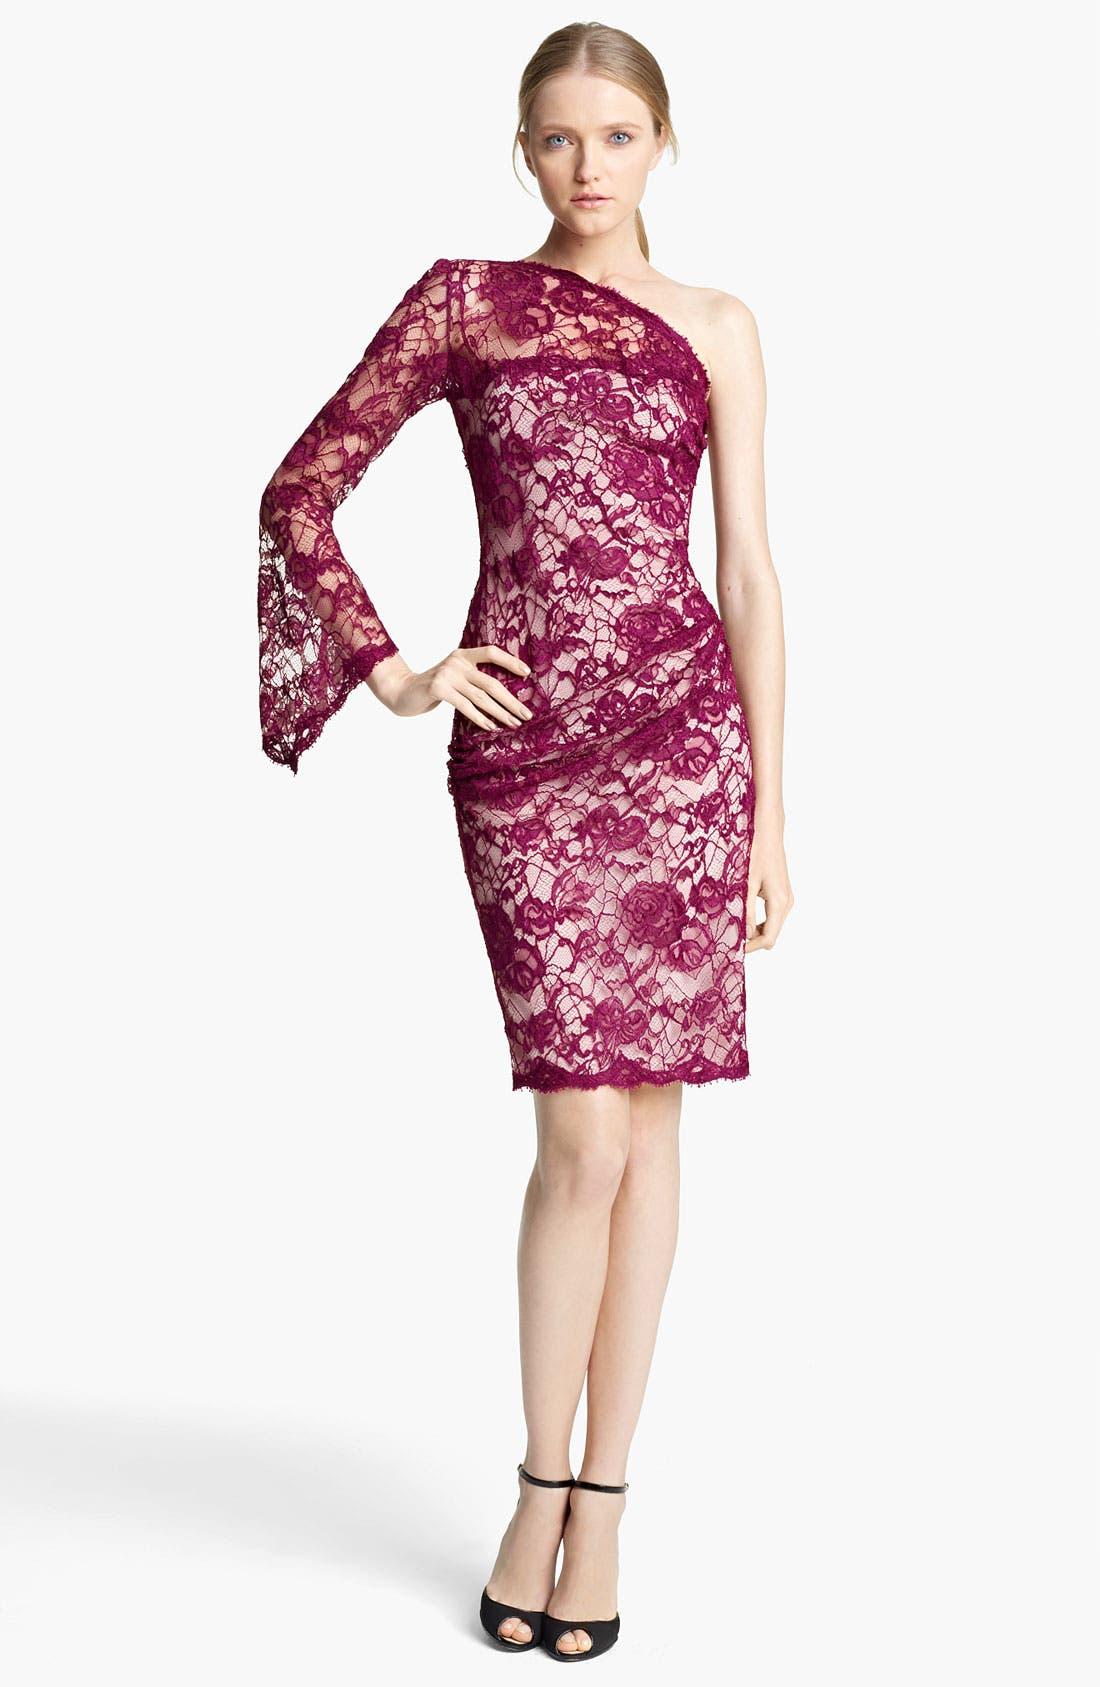 Alternate Image 1 Selected - Emilio Pucci One Shoulder Lace Dress